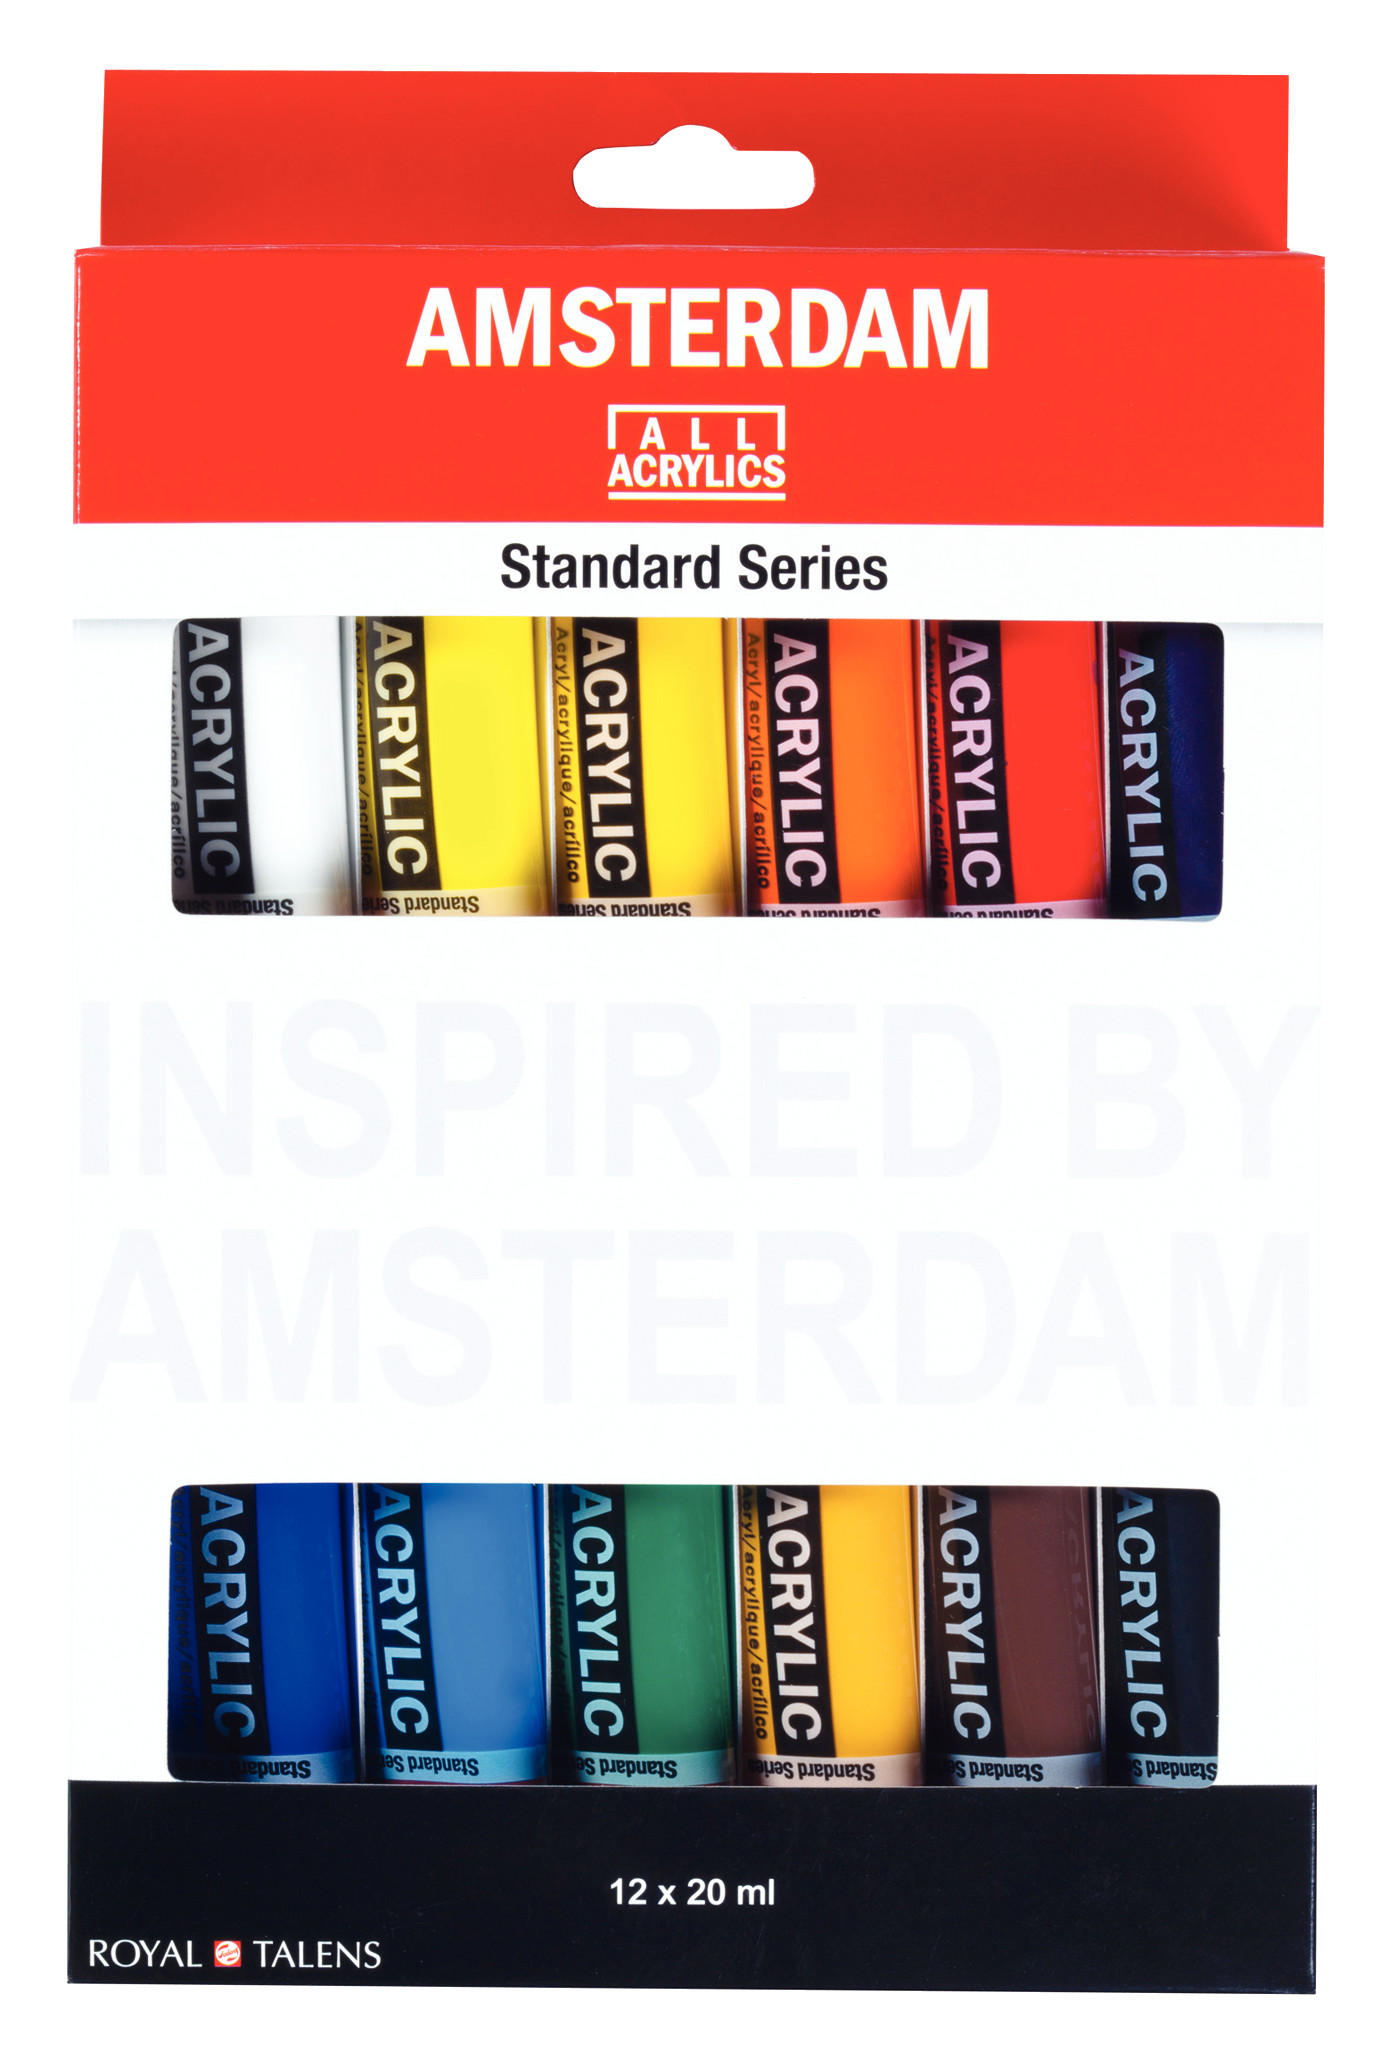 Amsterdam Standard Series Acrylics 12 x 20 ml Set